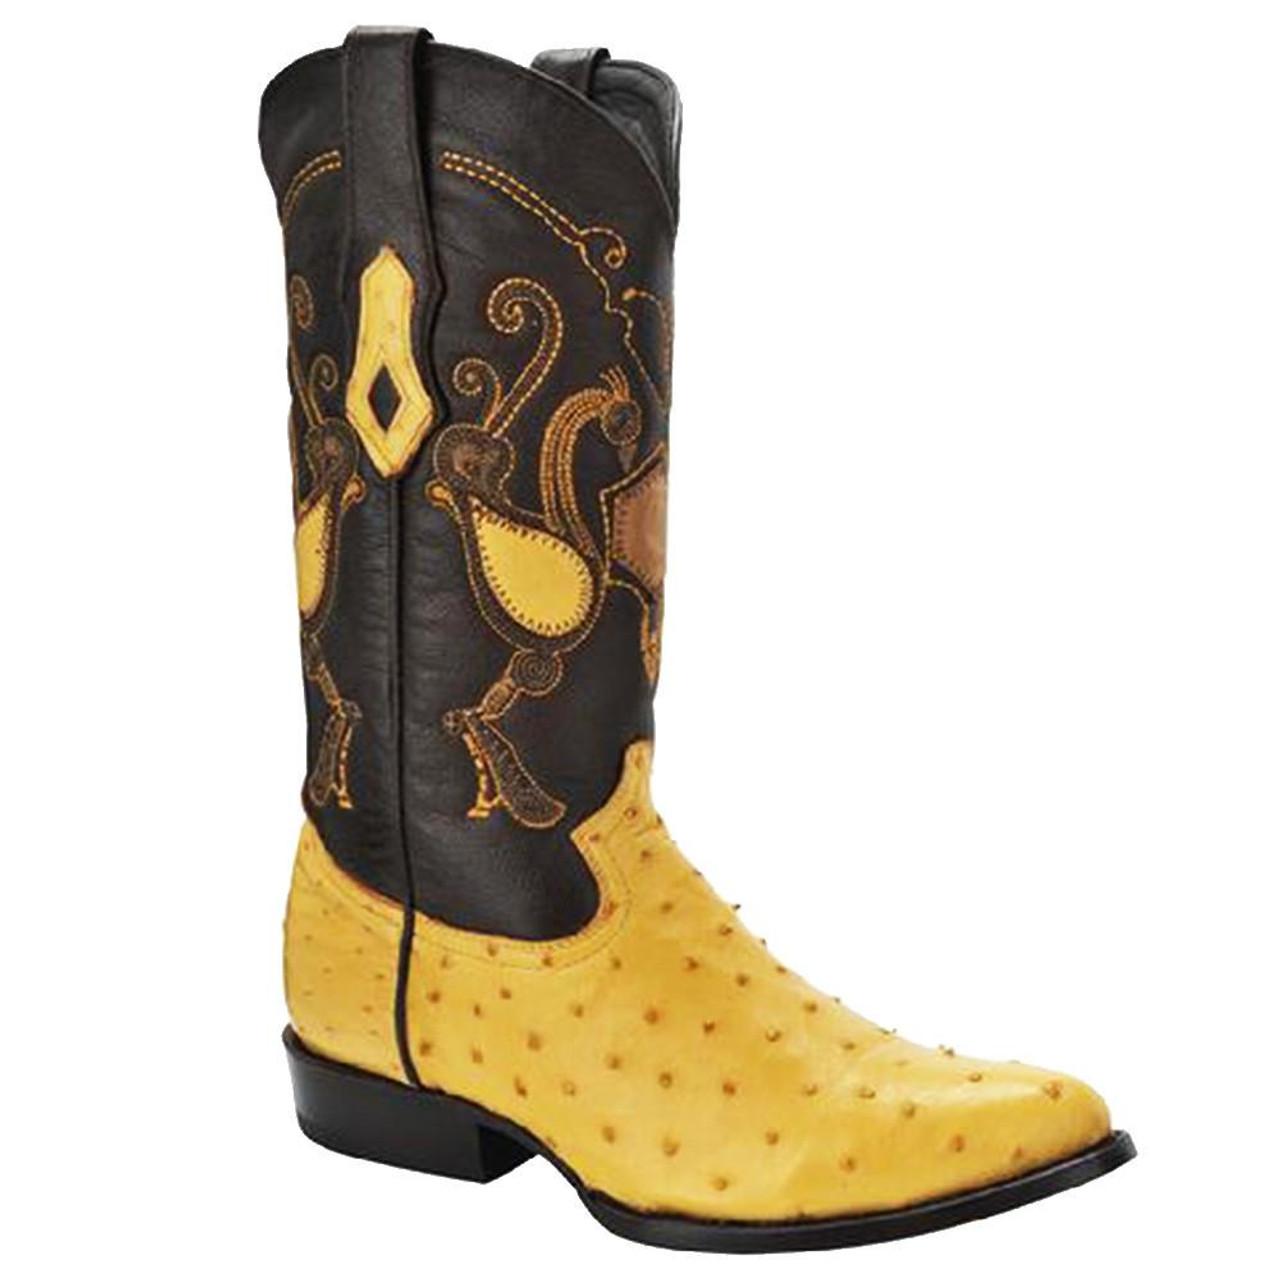 814c143342b Cuadra Men's Ostrich Cowboy Boots - Yellow